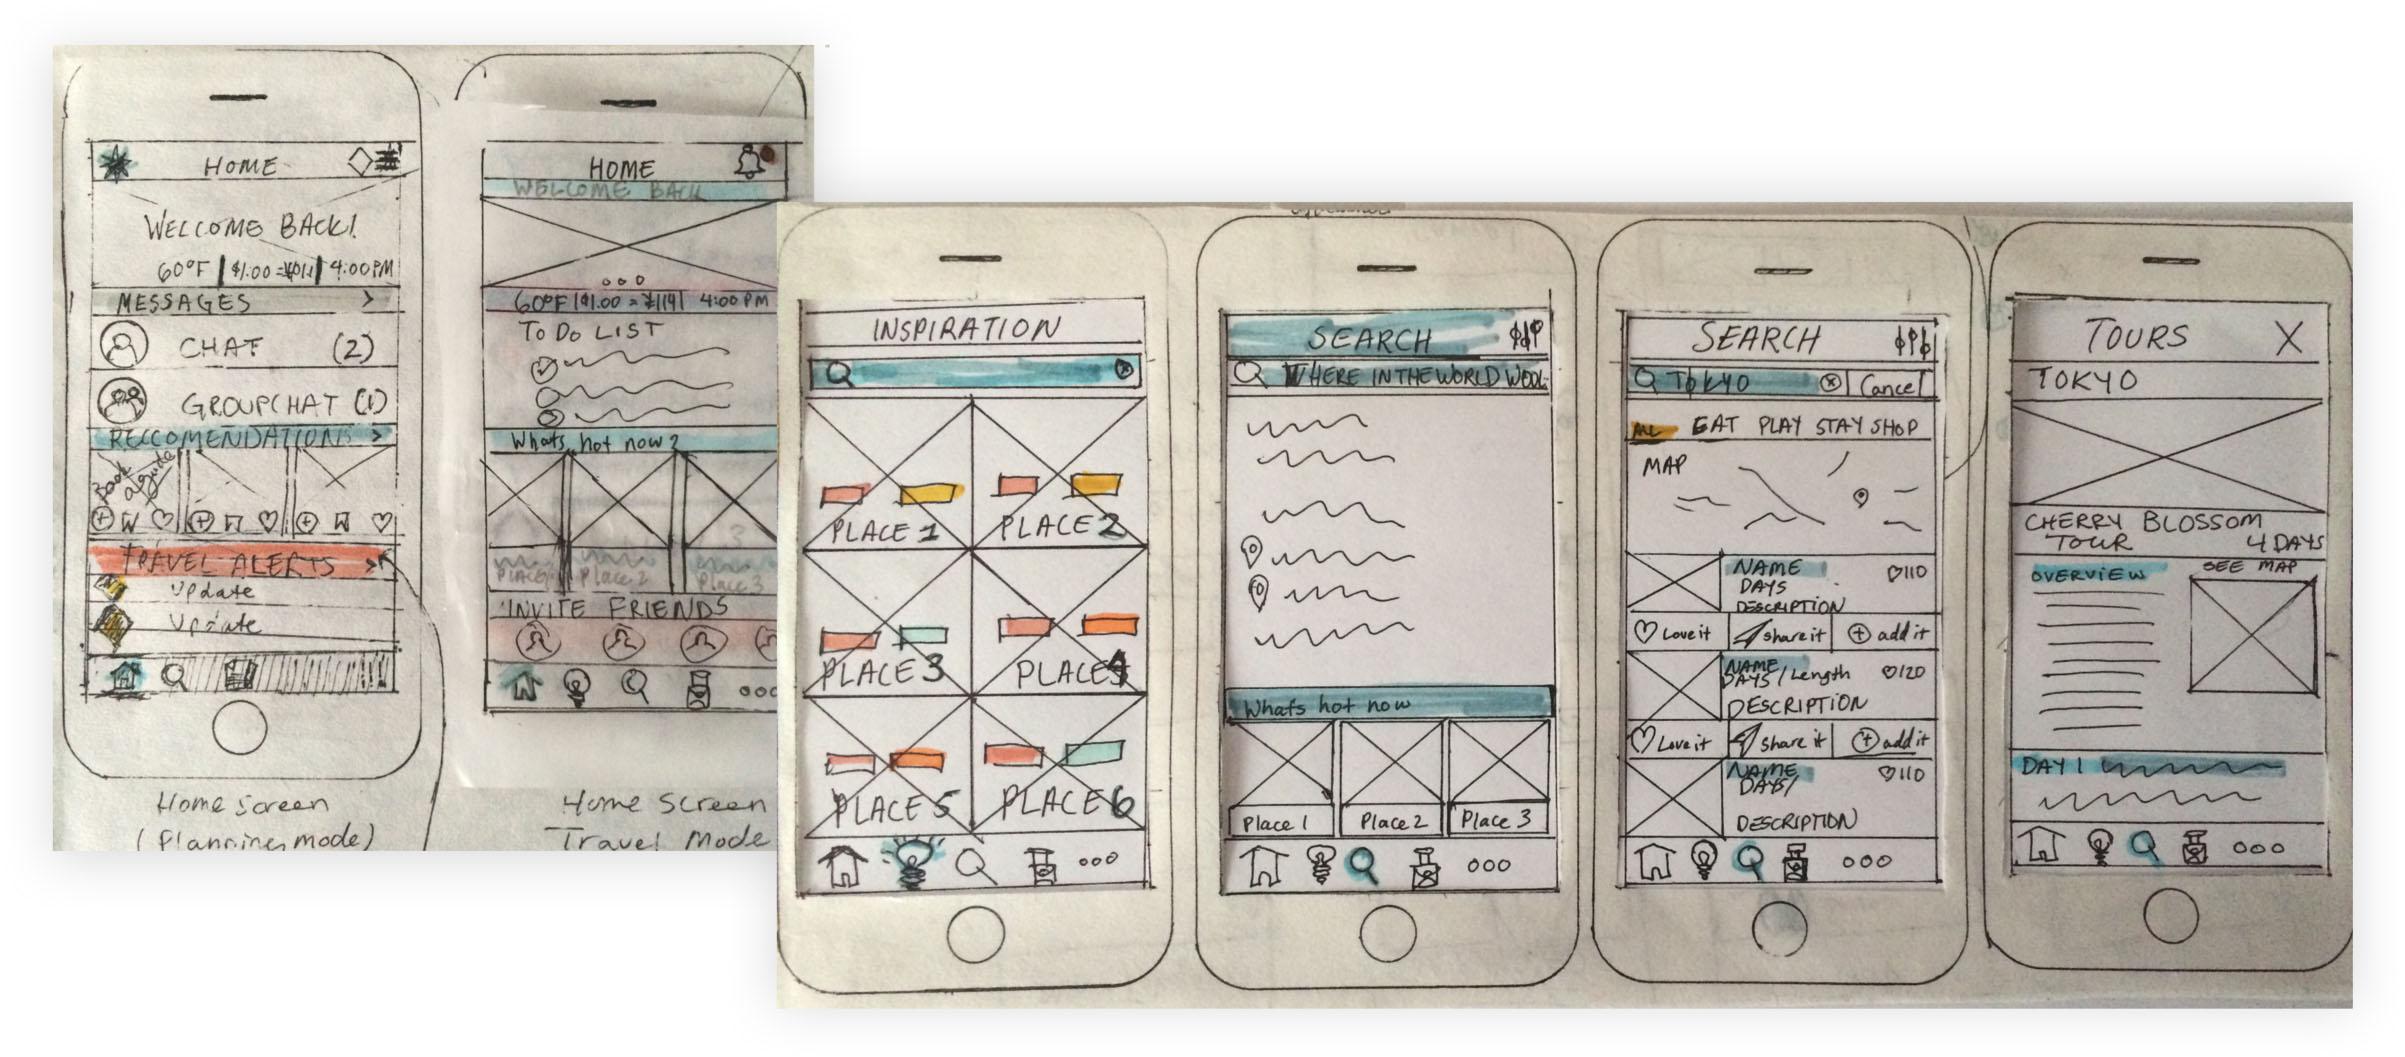 Diana Glozman UX Design